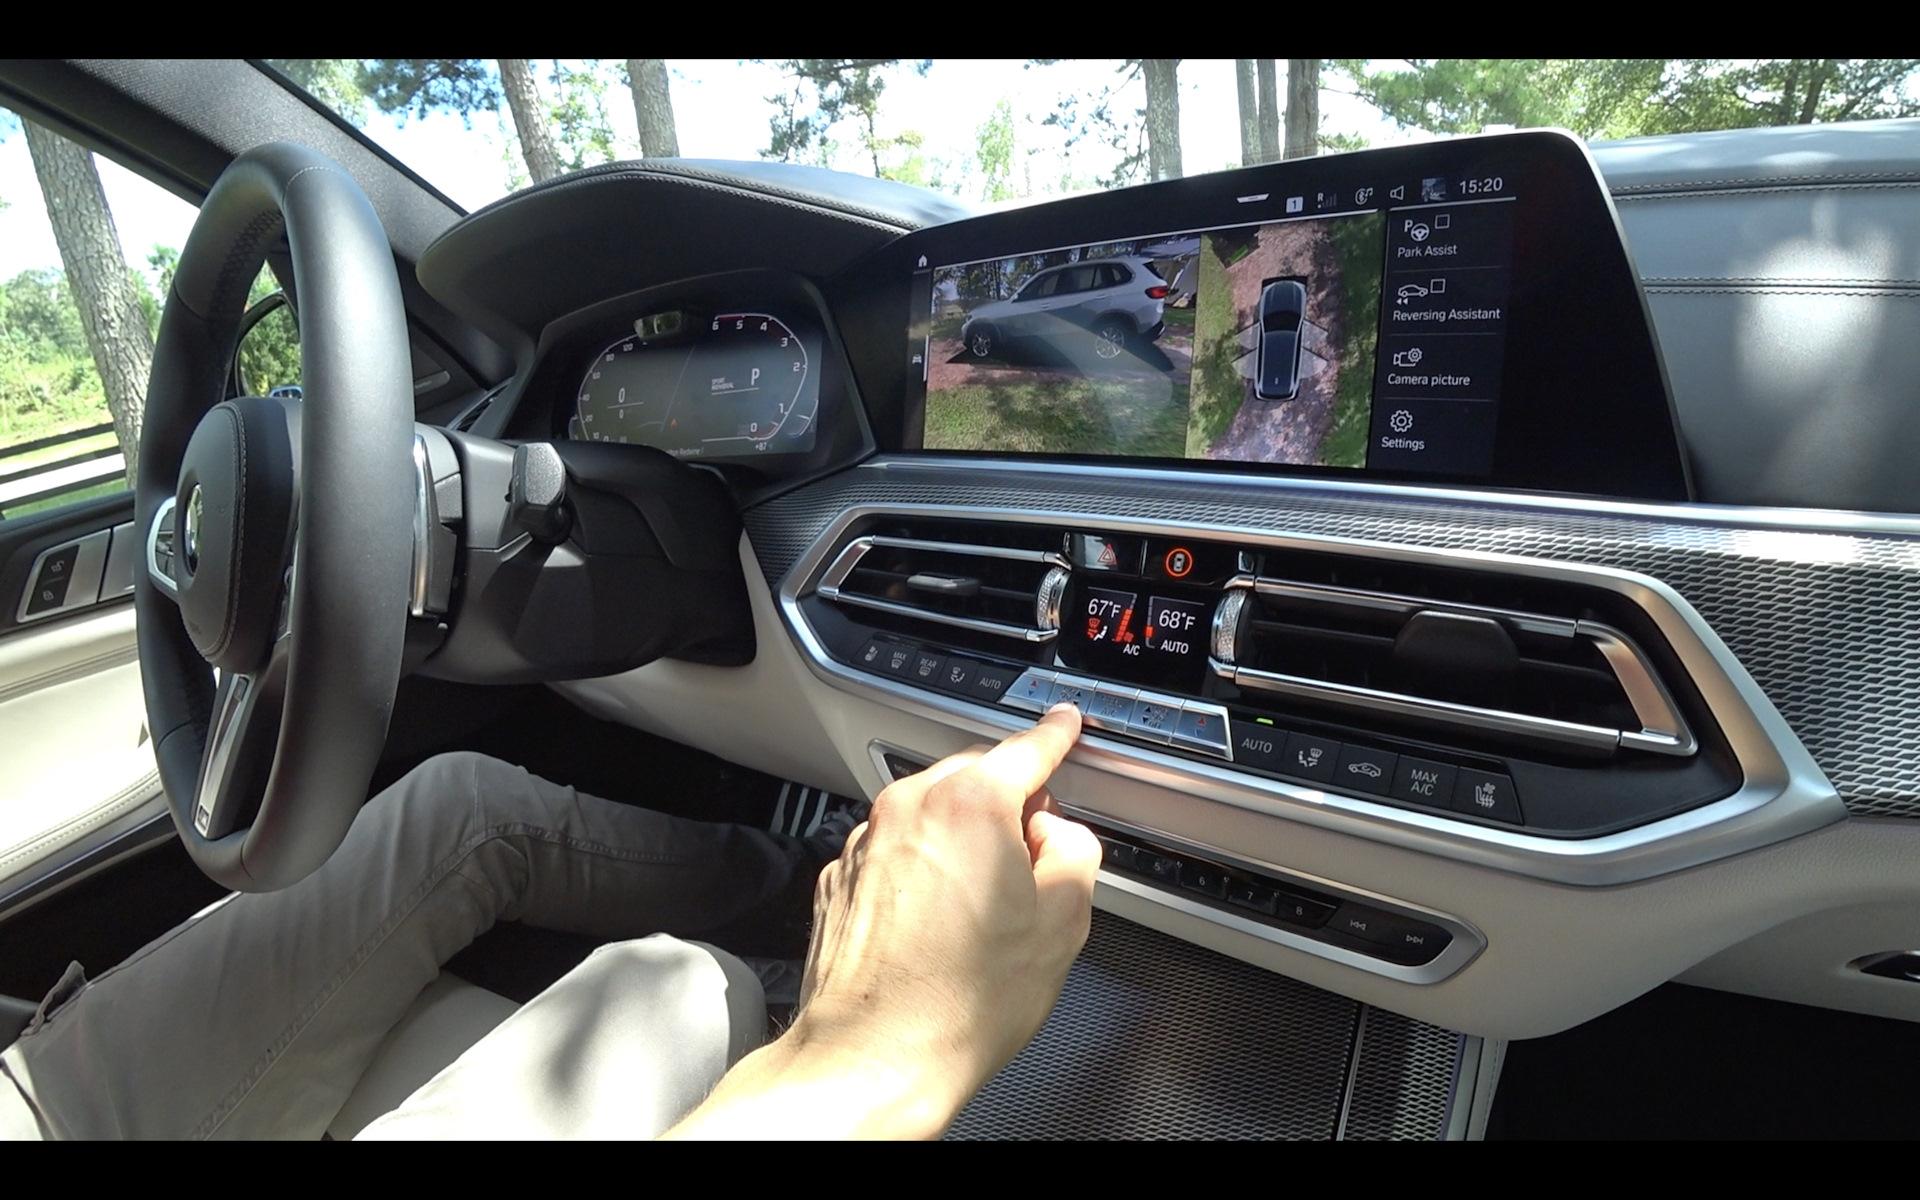 БМВ Х5 g05 экраны